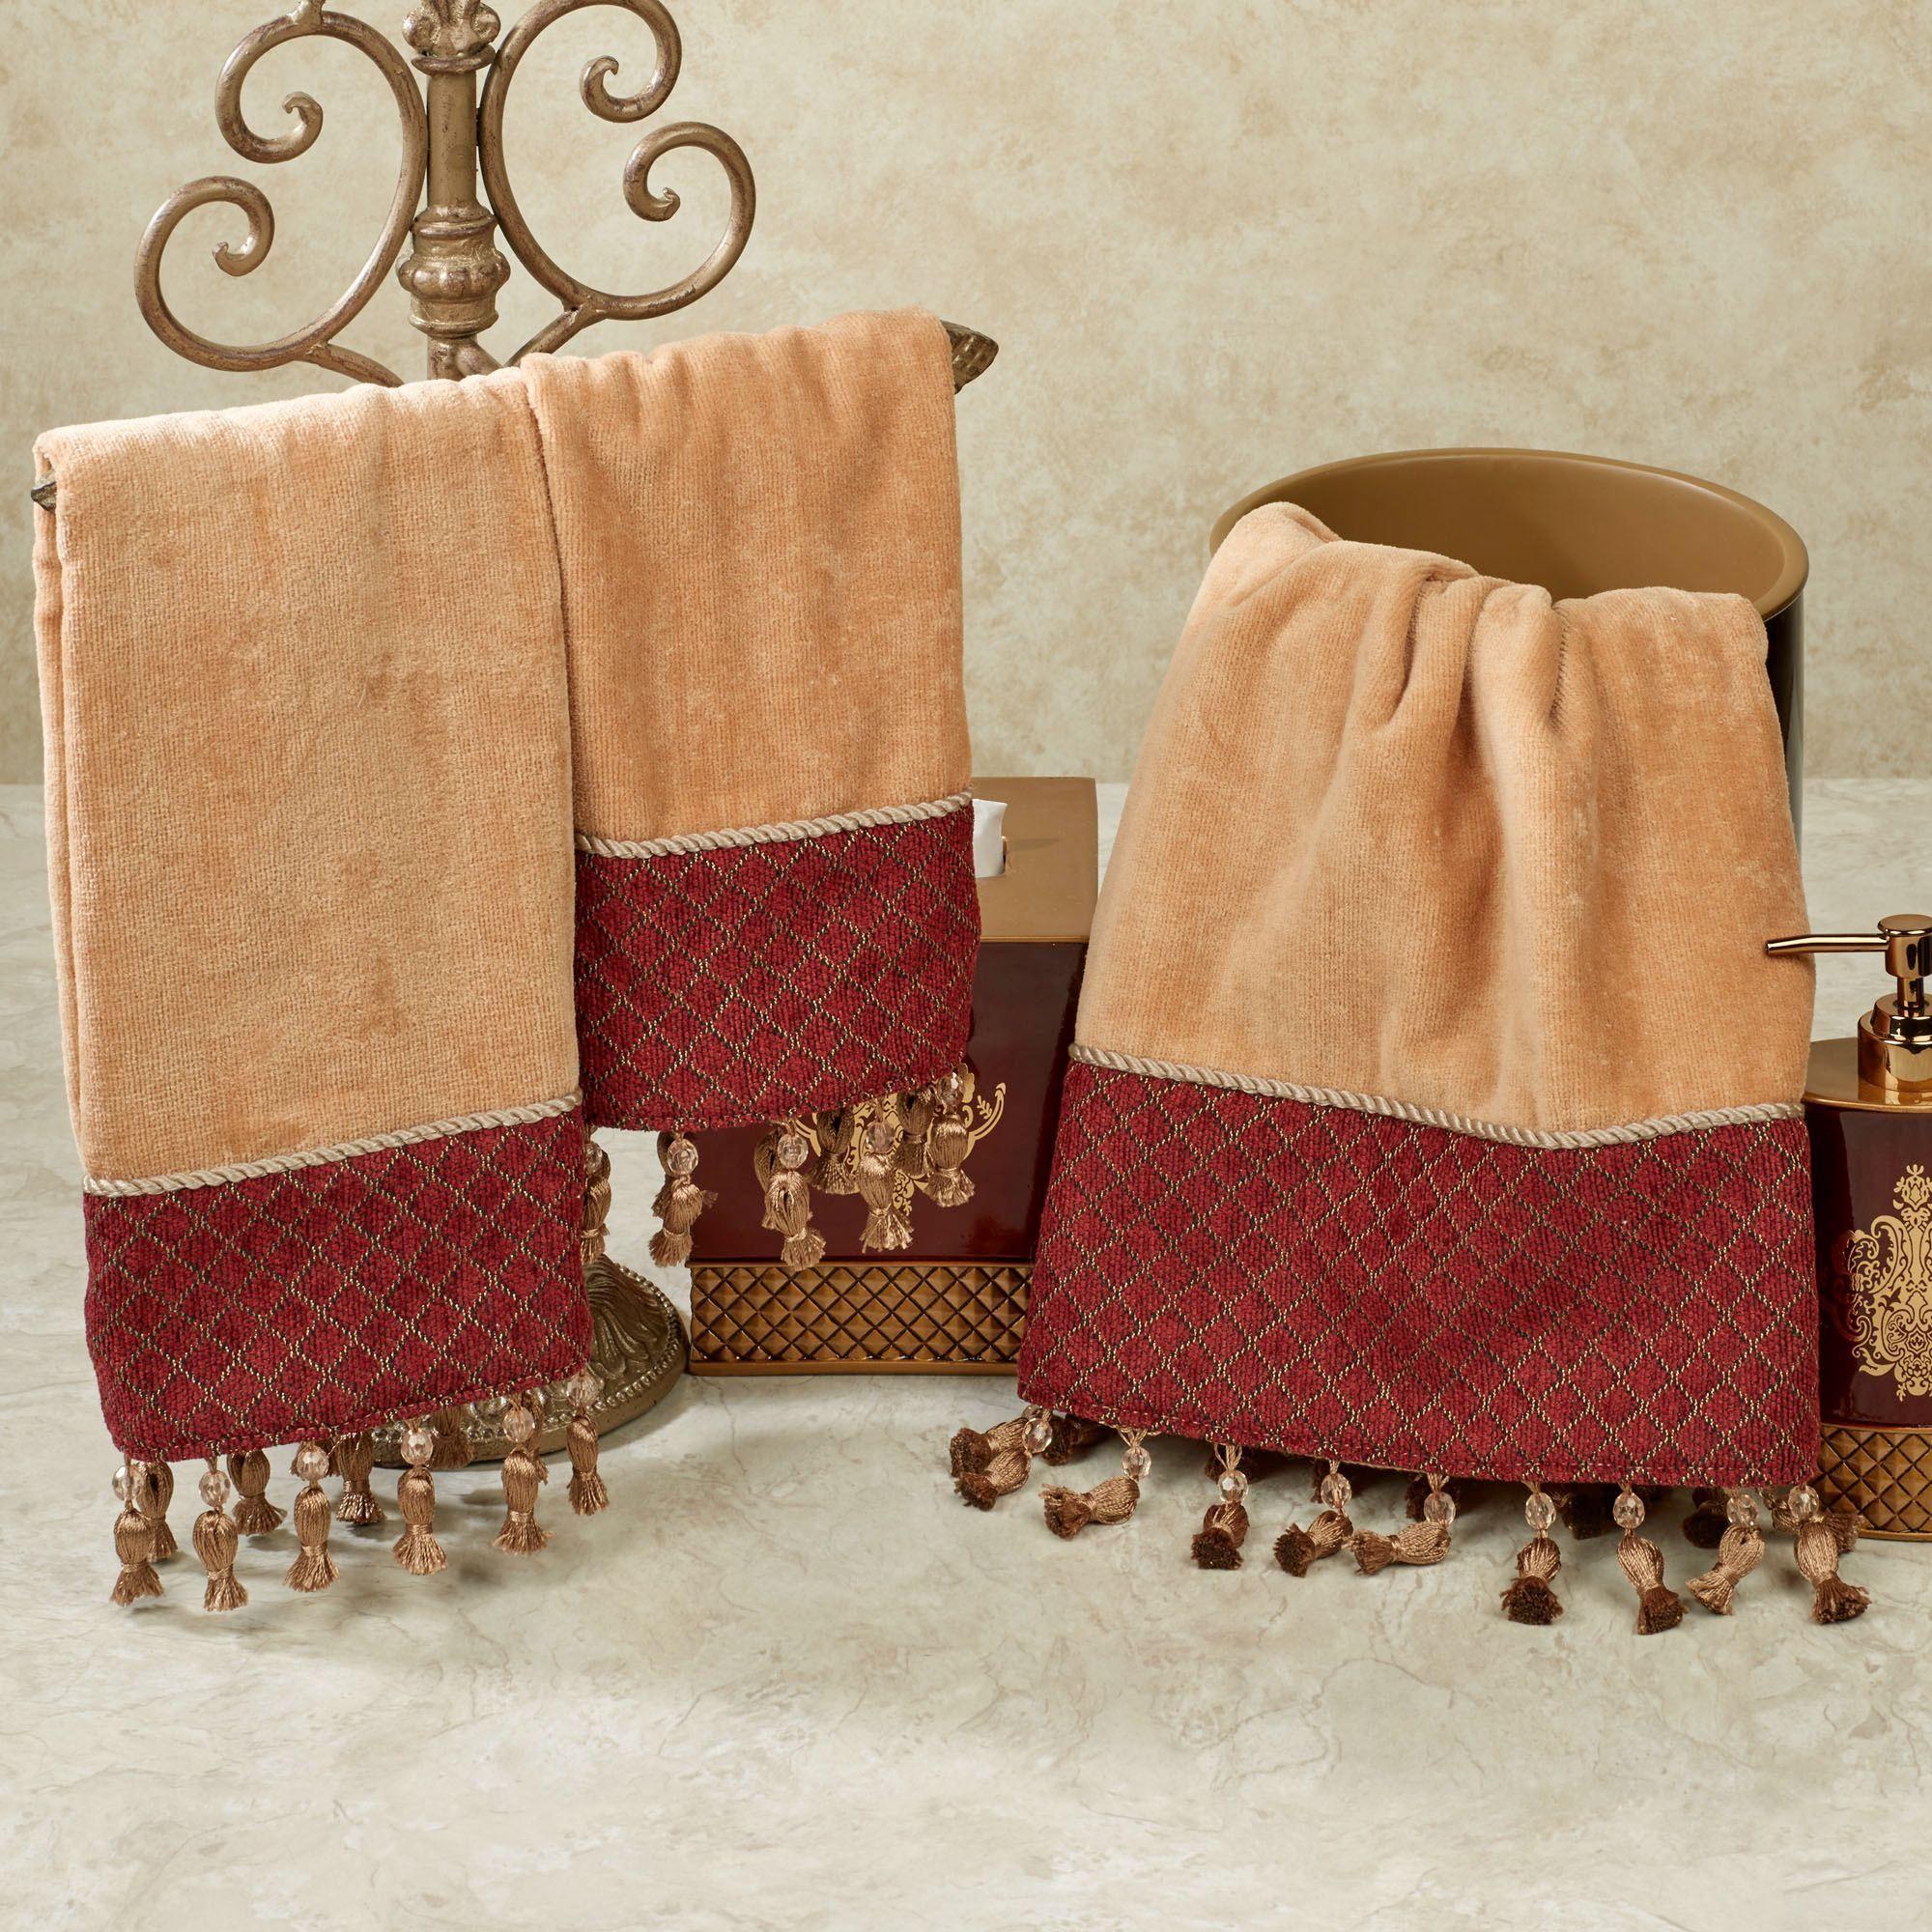 Montecito Beaded Tasseled Bath Towel Set